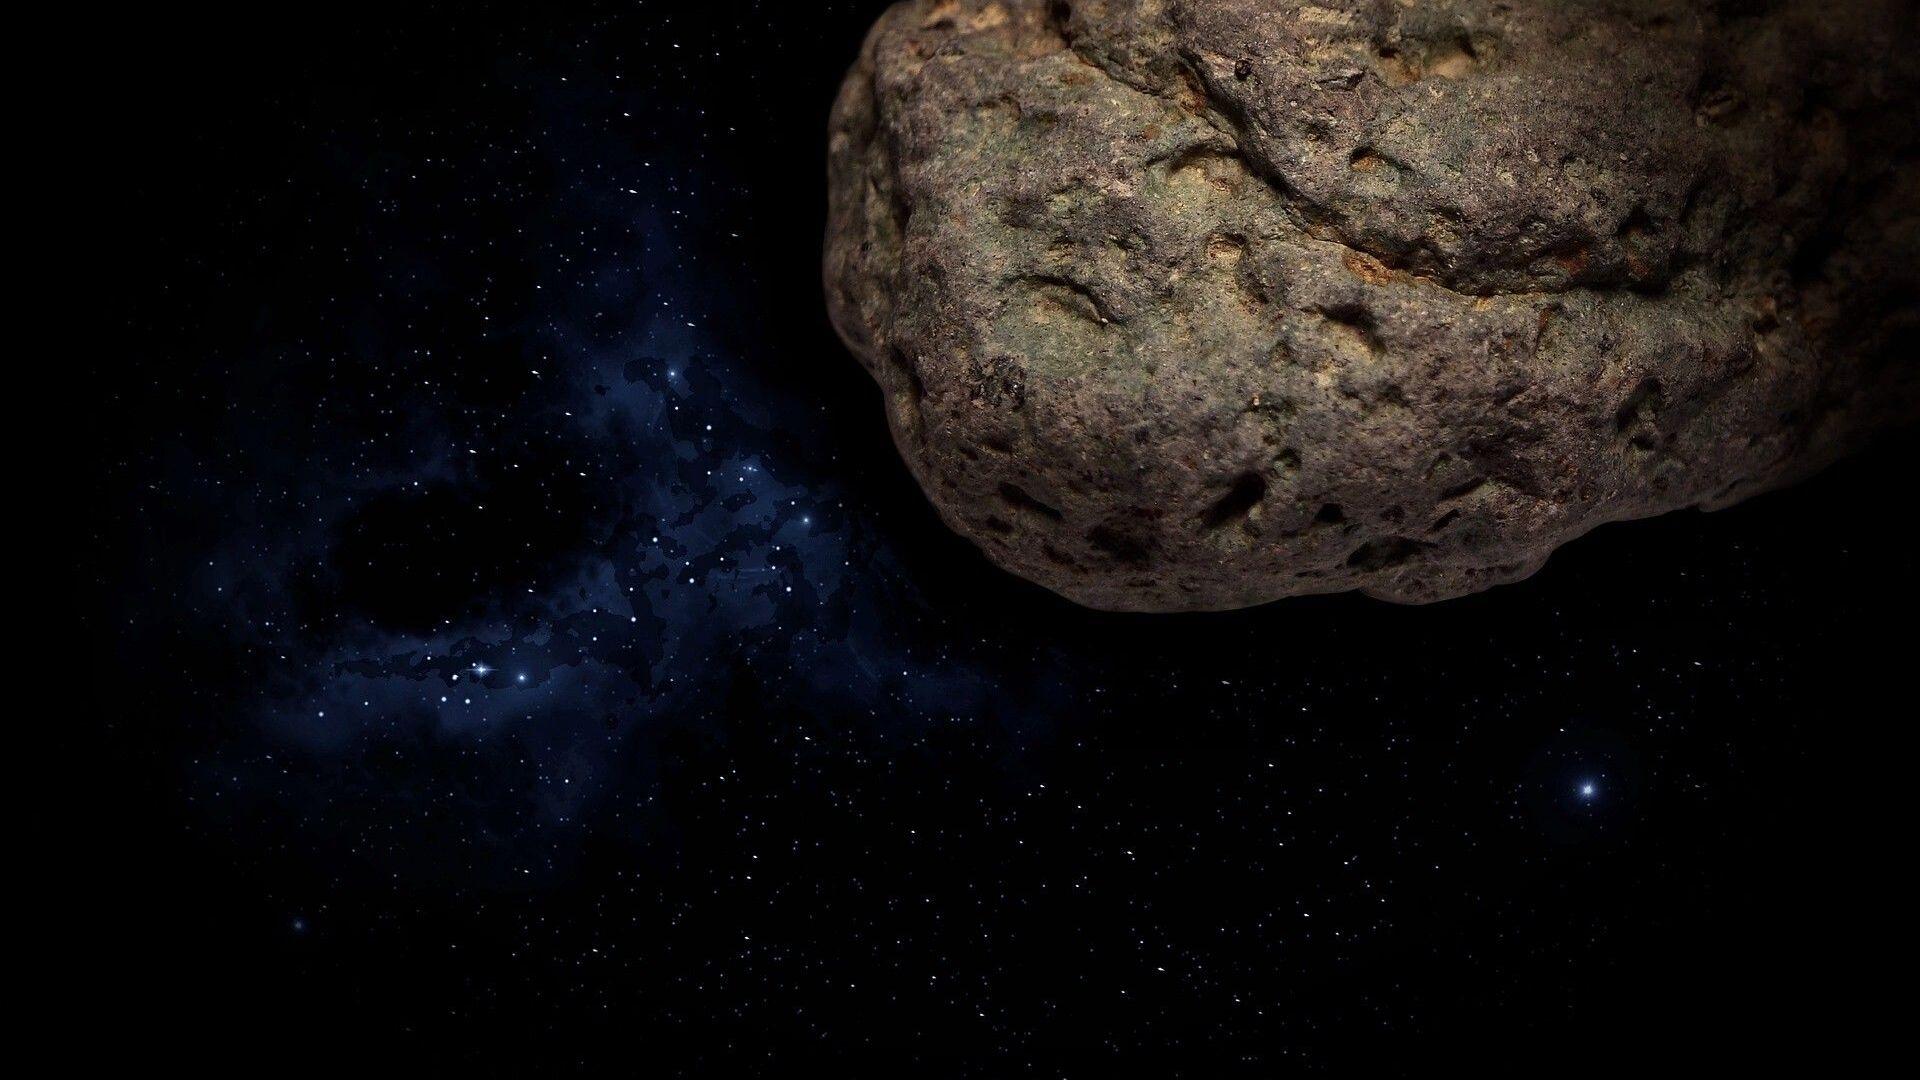 Астероид — илустрација - Sputnik Србија, 1920, 22.09.2021